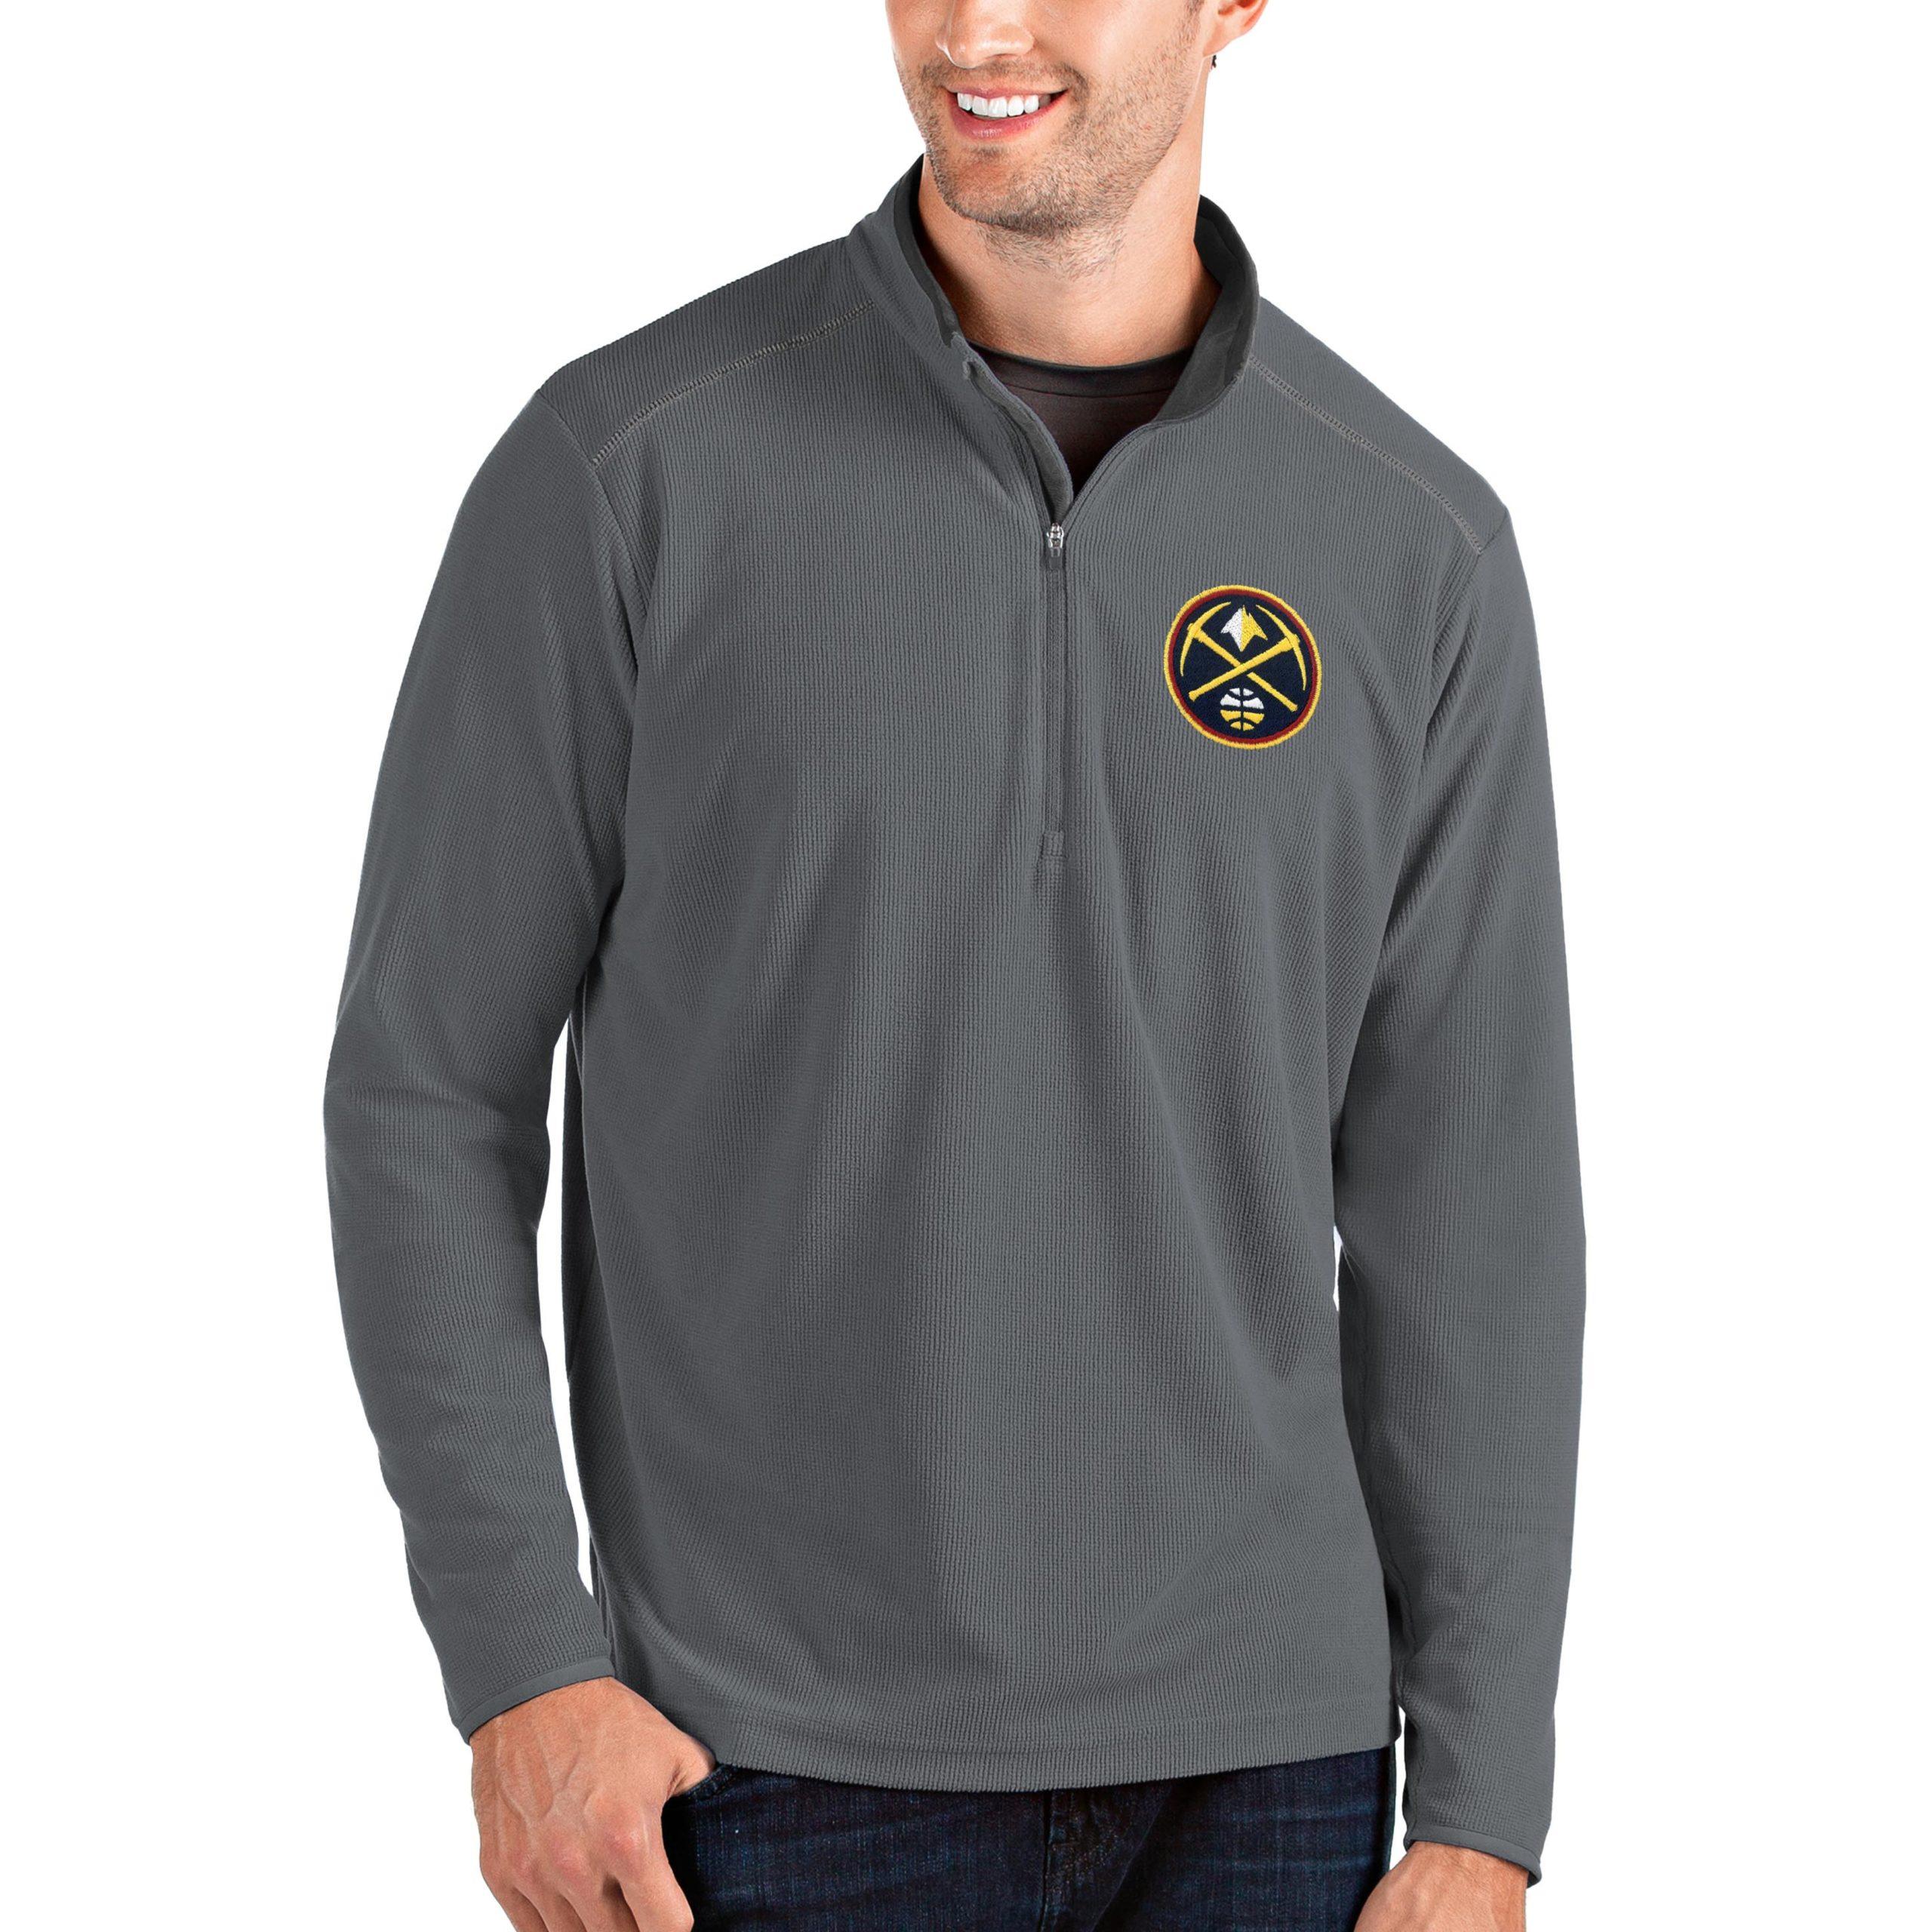 Denver Nuggets Antigua Big & Tall Glacier Quarter-Zip Pullover Jacket - Gray/Gray